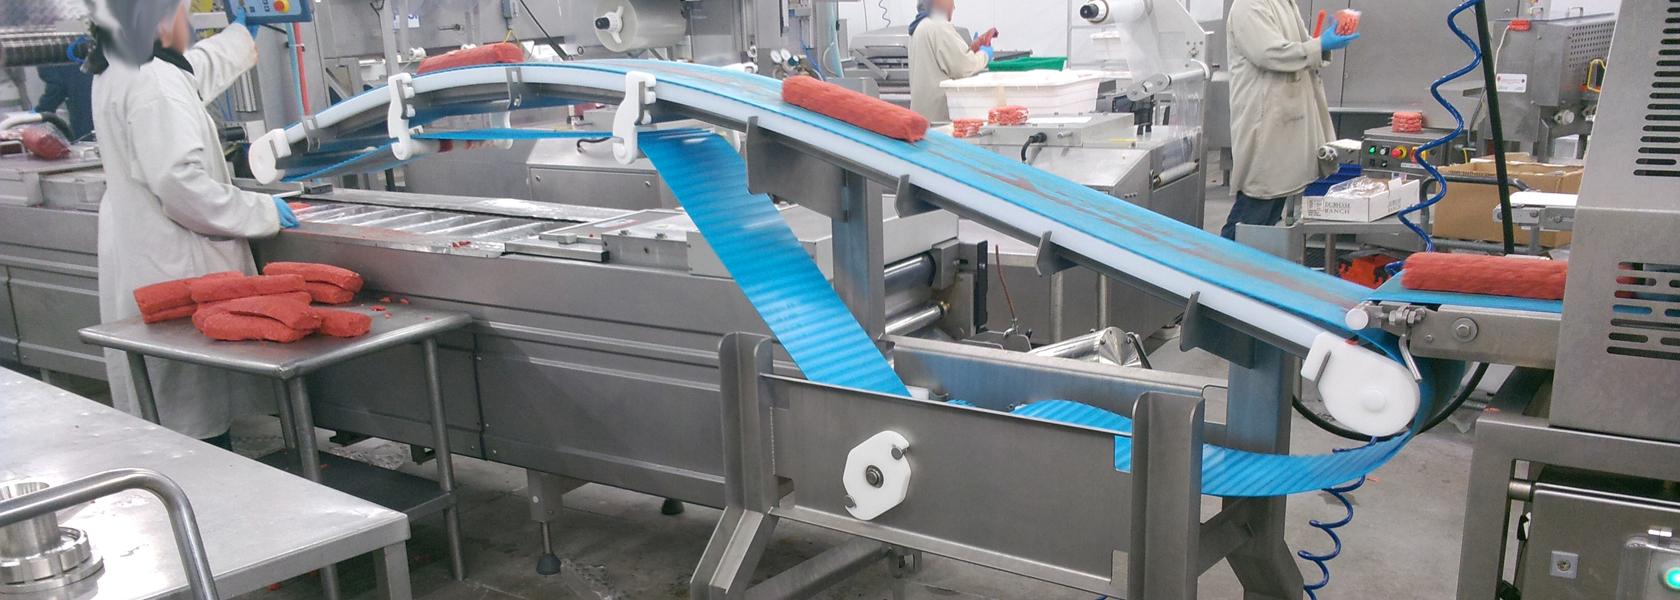 PH-Header-Meat Industry-001.jpg